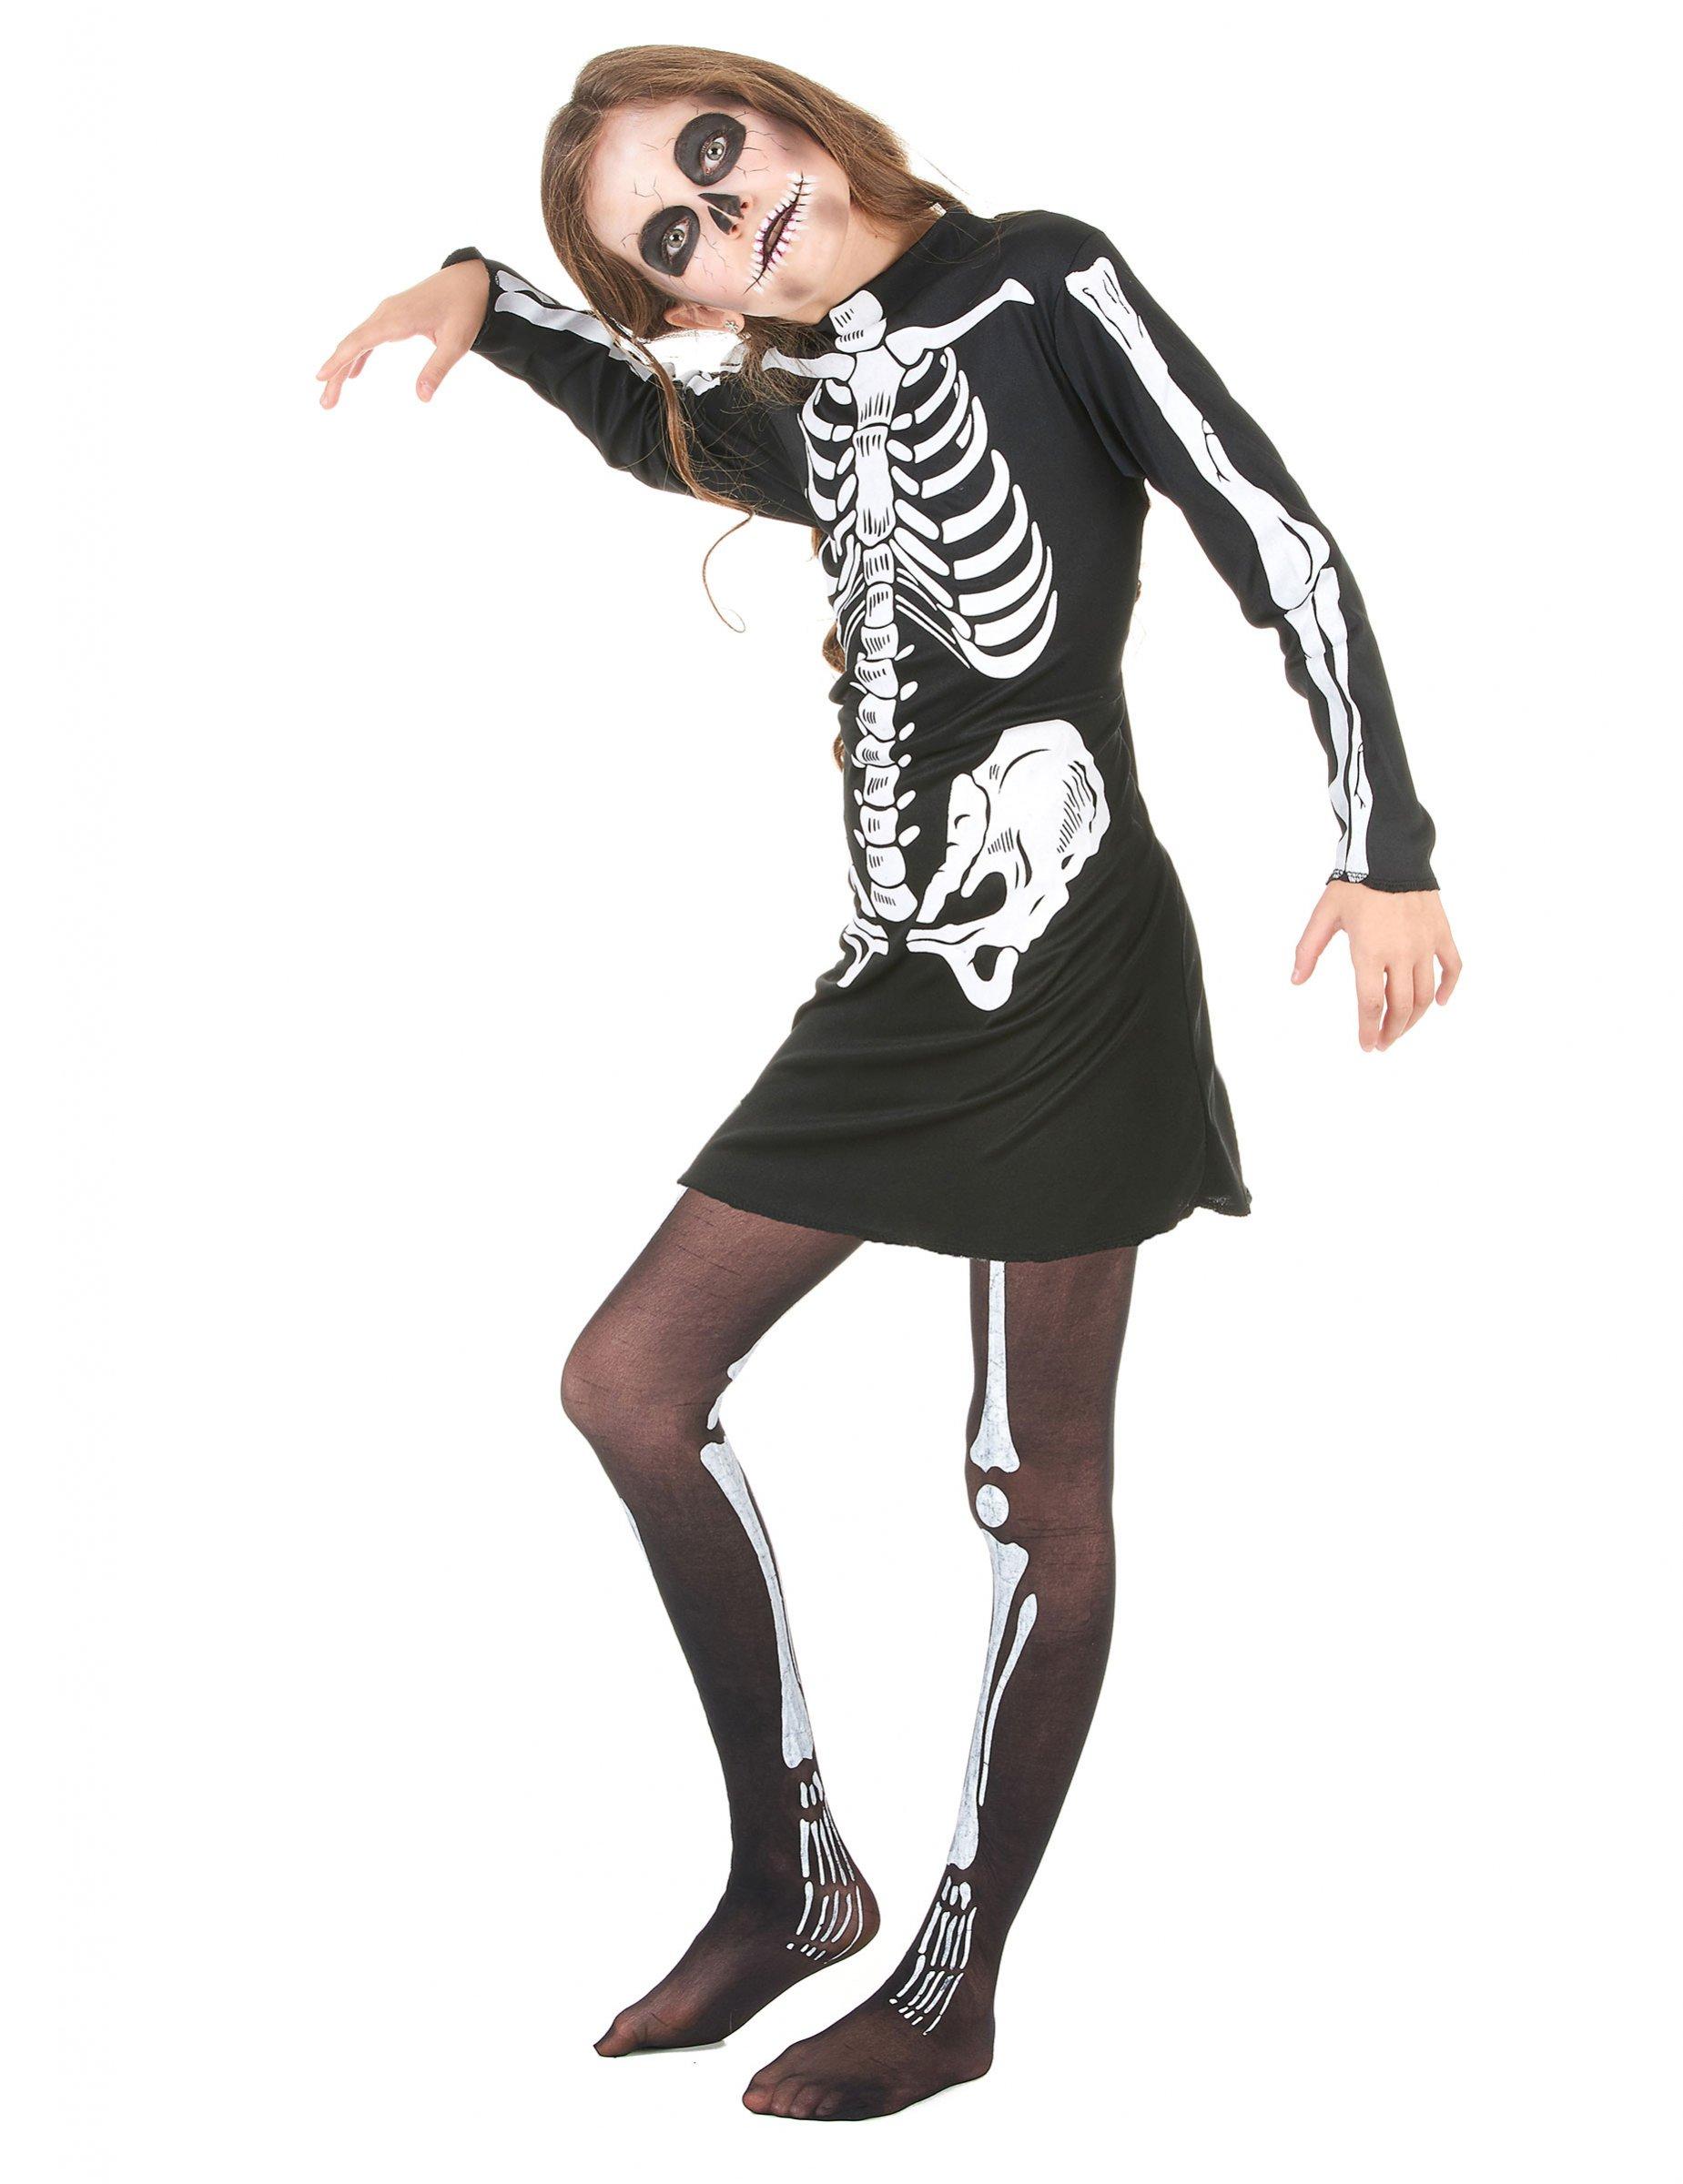 Costume da scheletro per bambina - Halloween  Costumi bambini 1da283bd5ac7